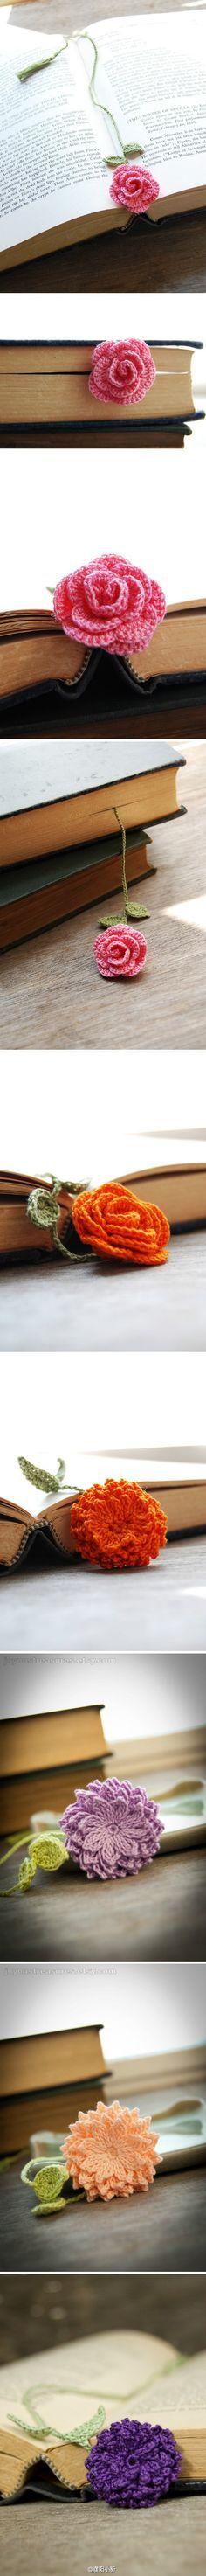 pretty bookmarks - crochet flowers